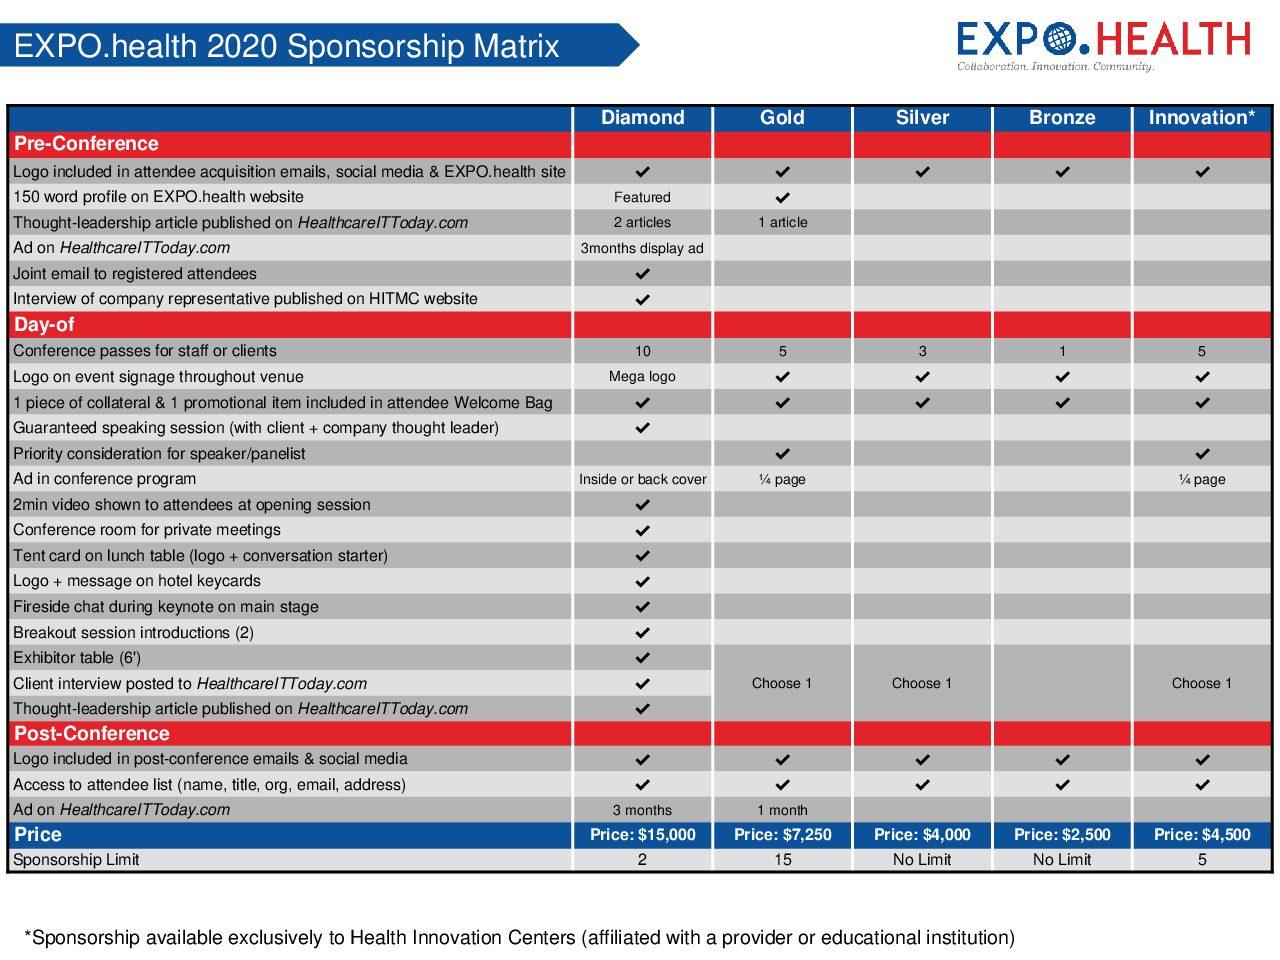 EXPO Health 2020 – Sponsor Matrix